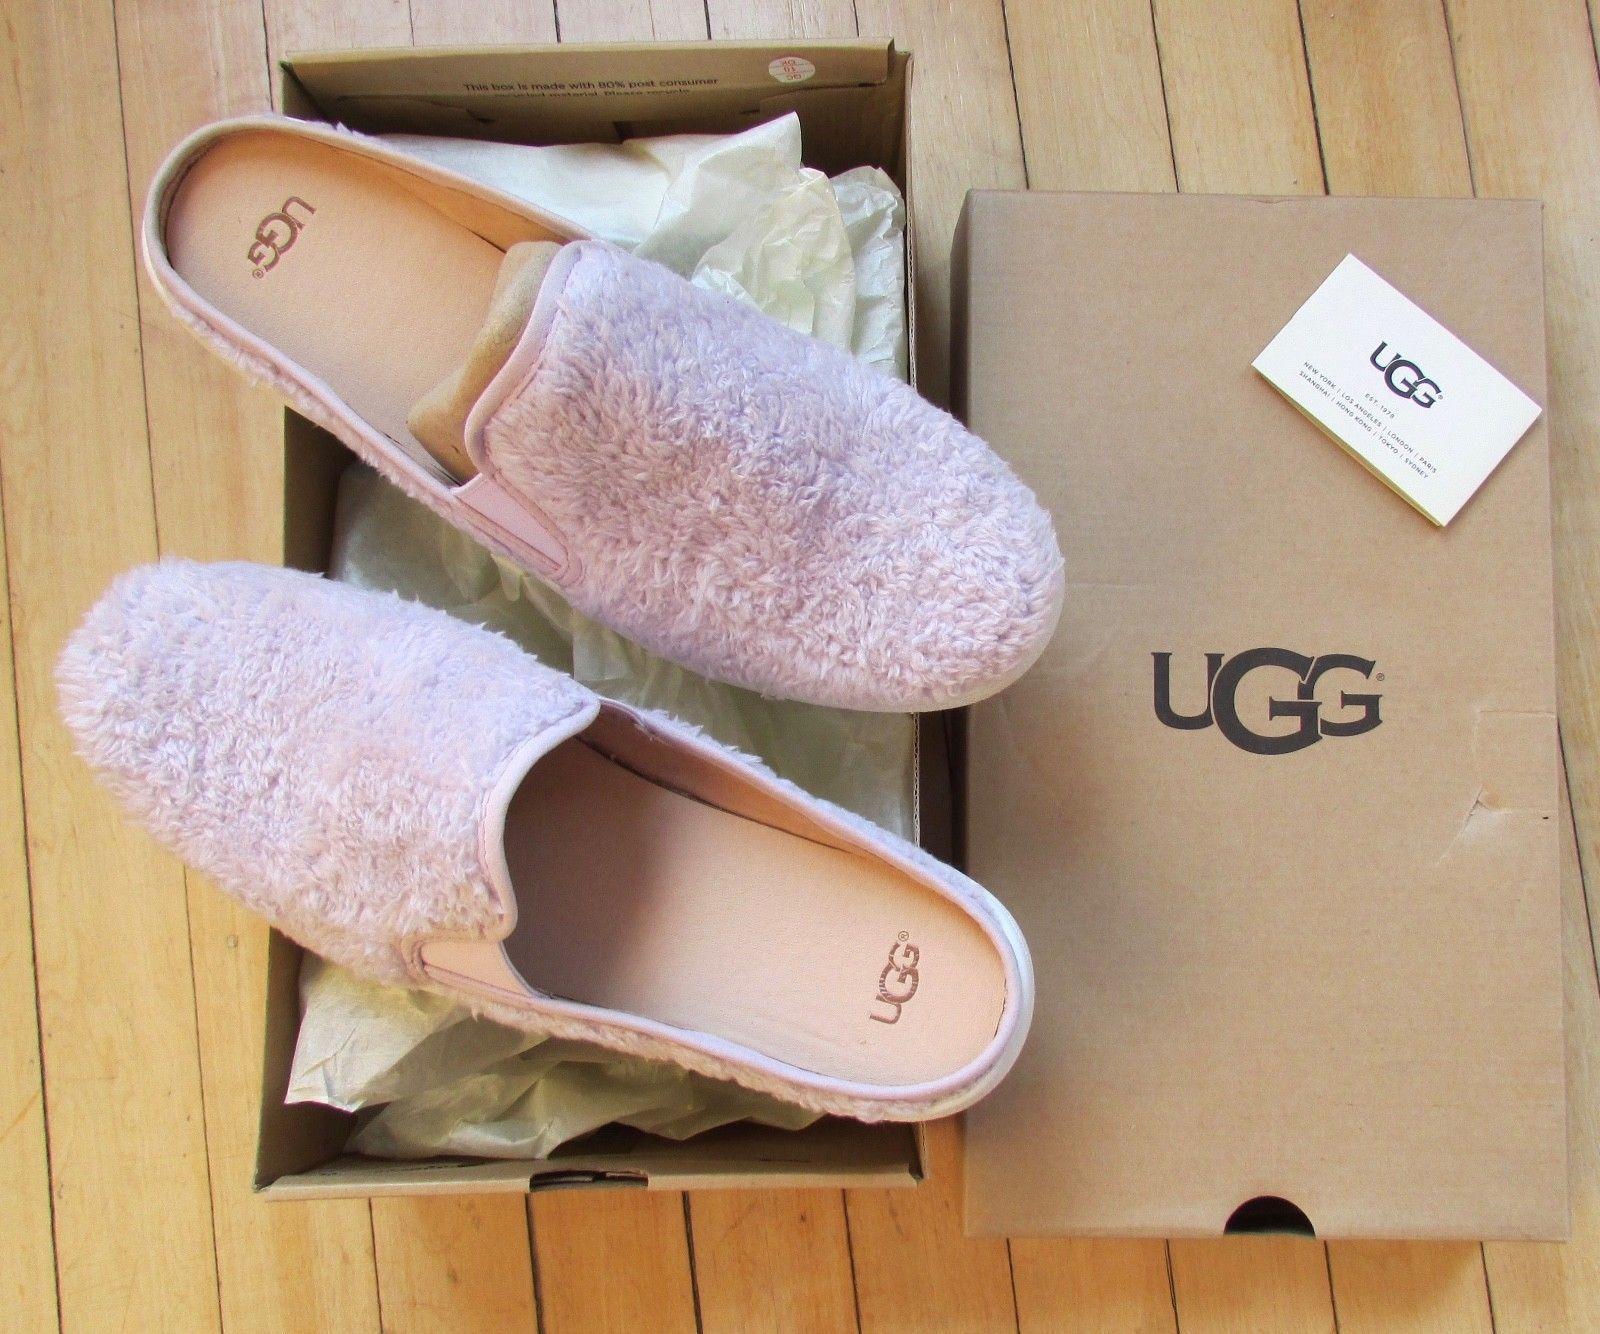 d3963864c UGG Slippers Luci Slip On Lavender Fog Size and 50 similar items